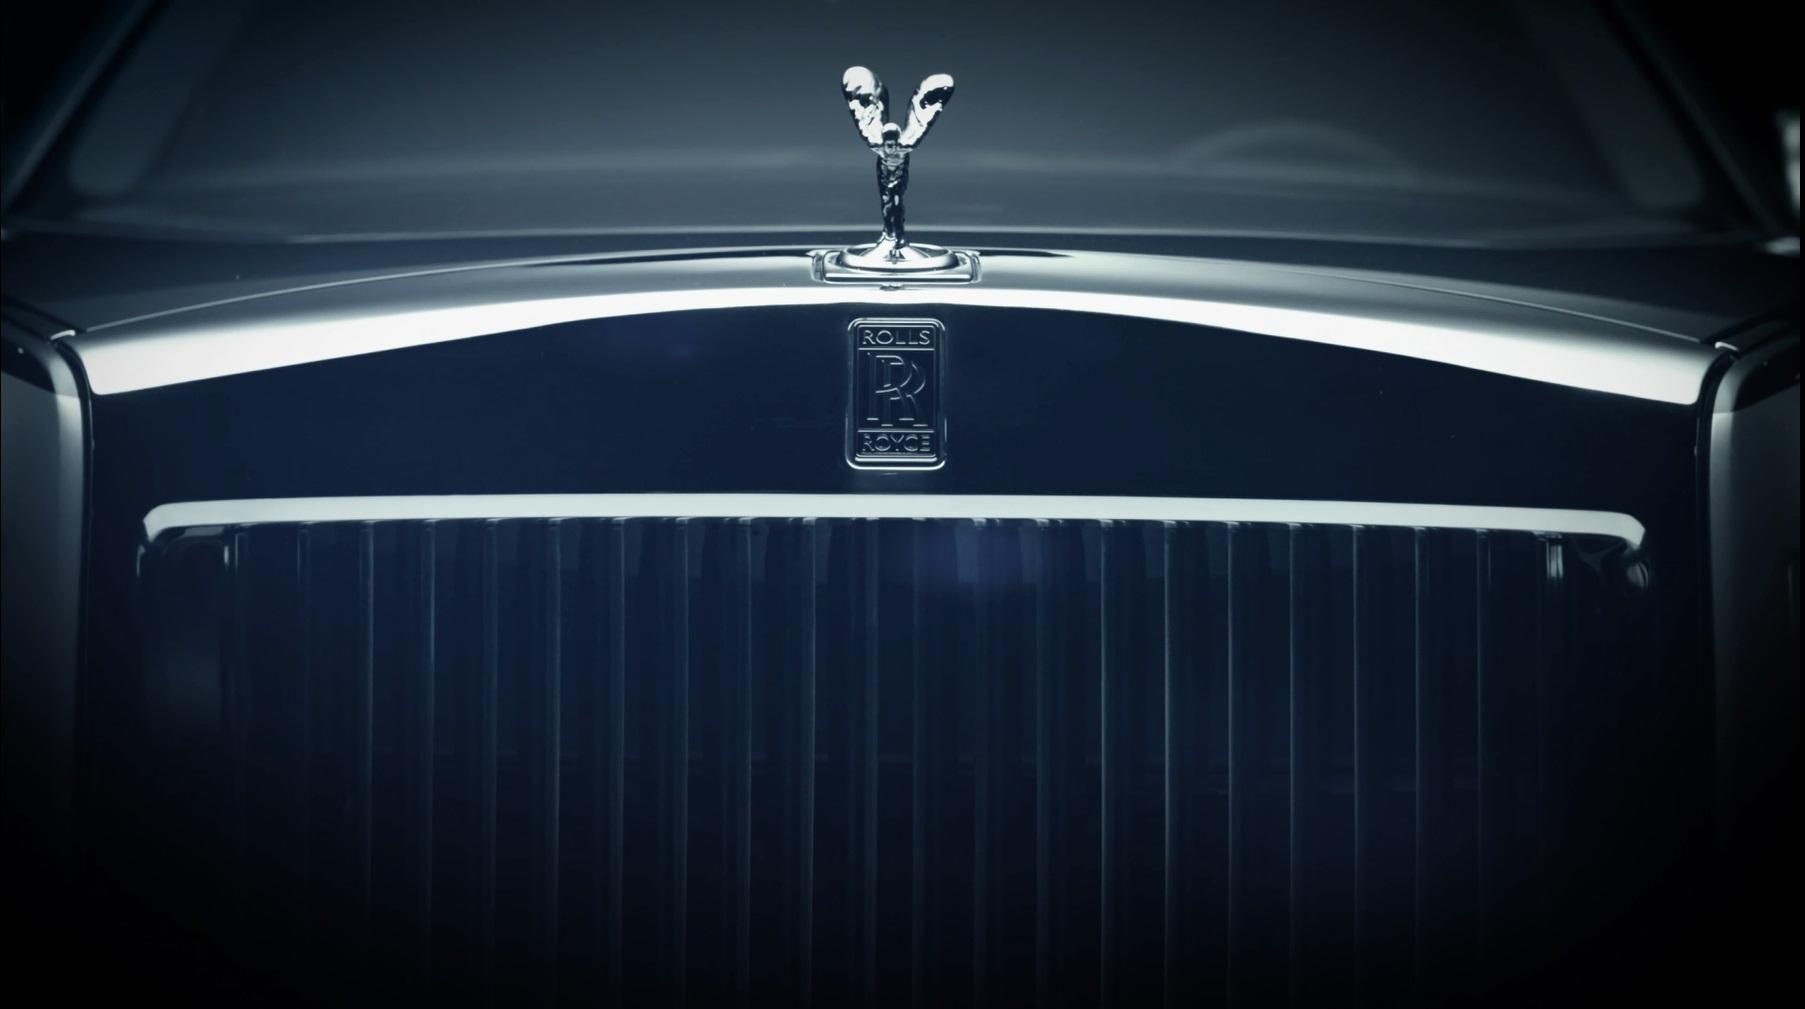 Rolls-Royce Phantom Film_1.jpg